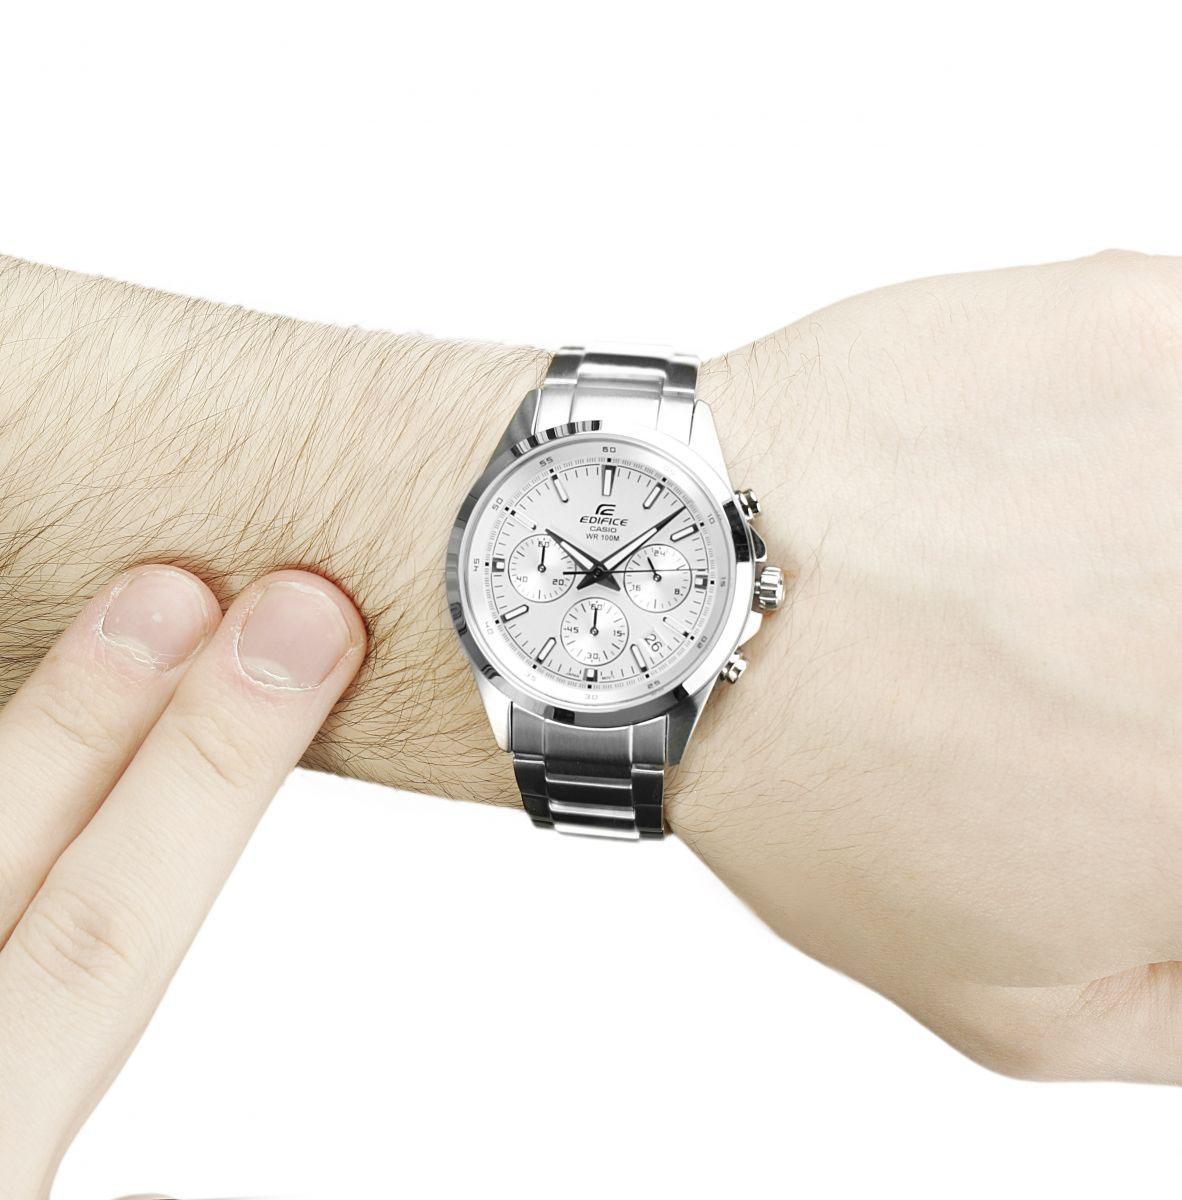 Đồng hồ nam dây kim loại Casio EDIFICE EFR-527D-7AVUDF